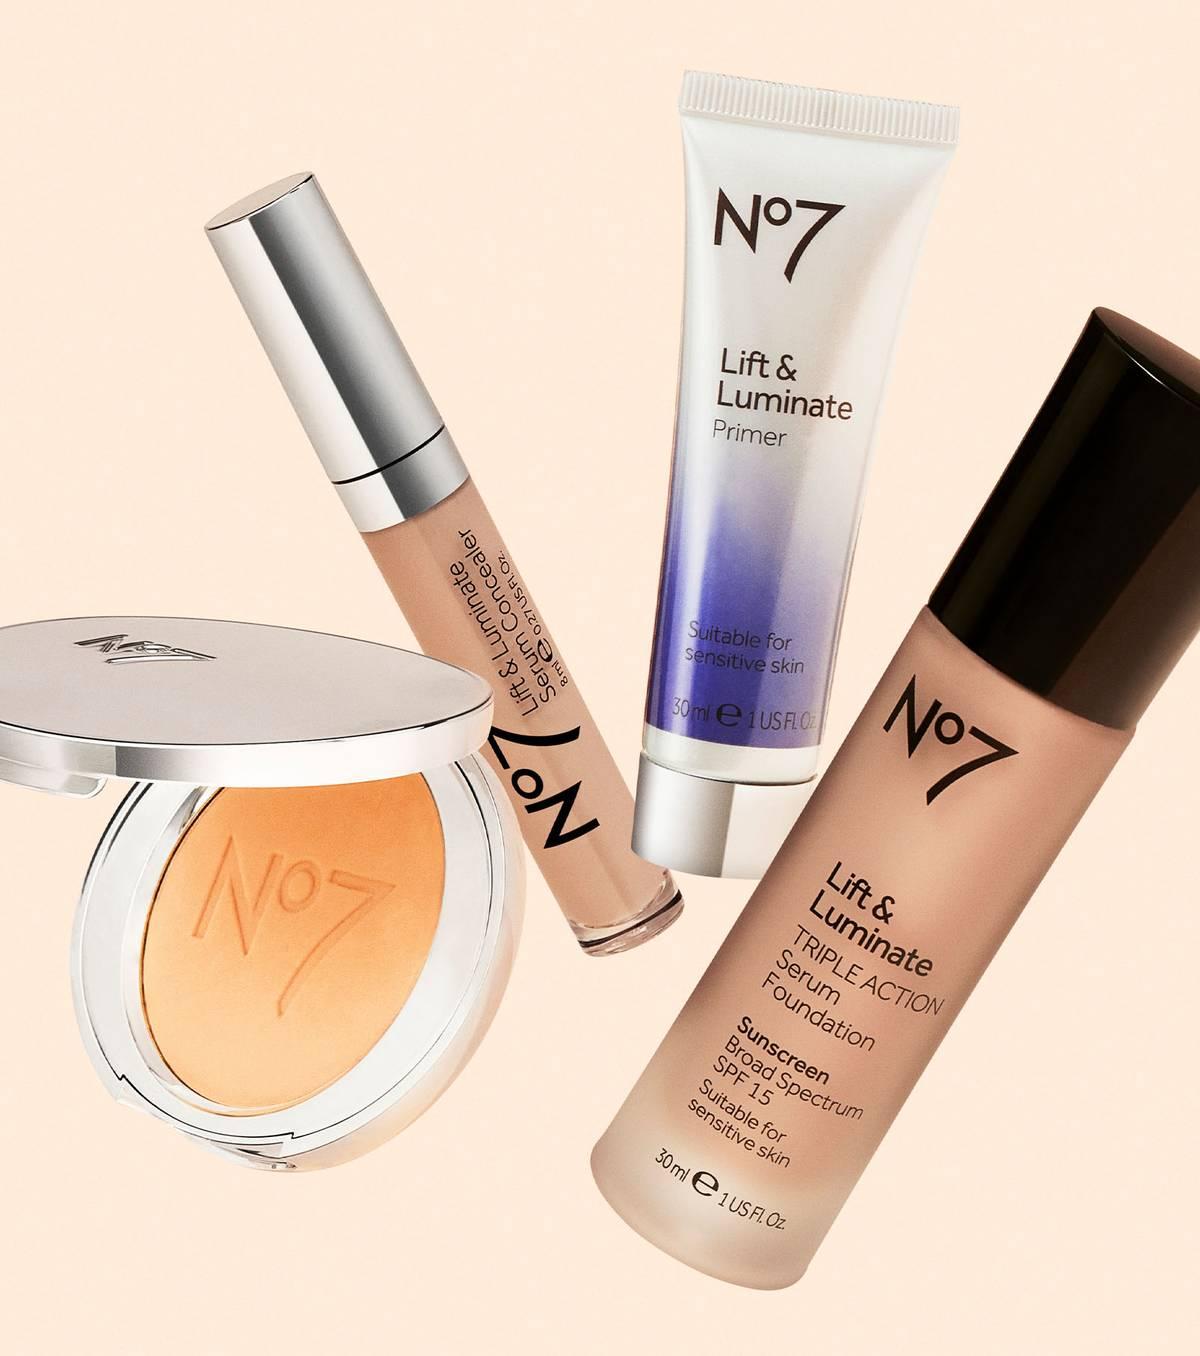 lift and luminate makeup collection